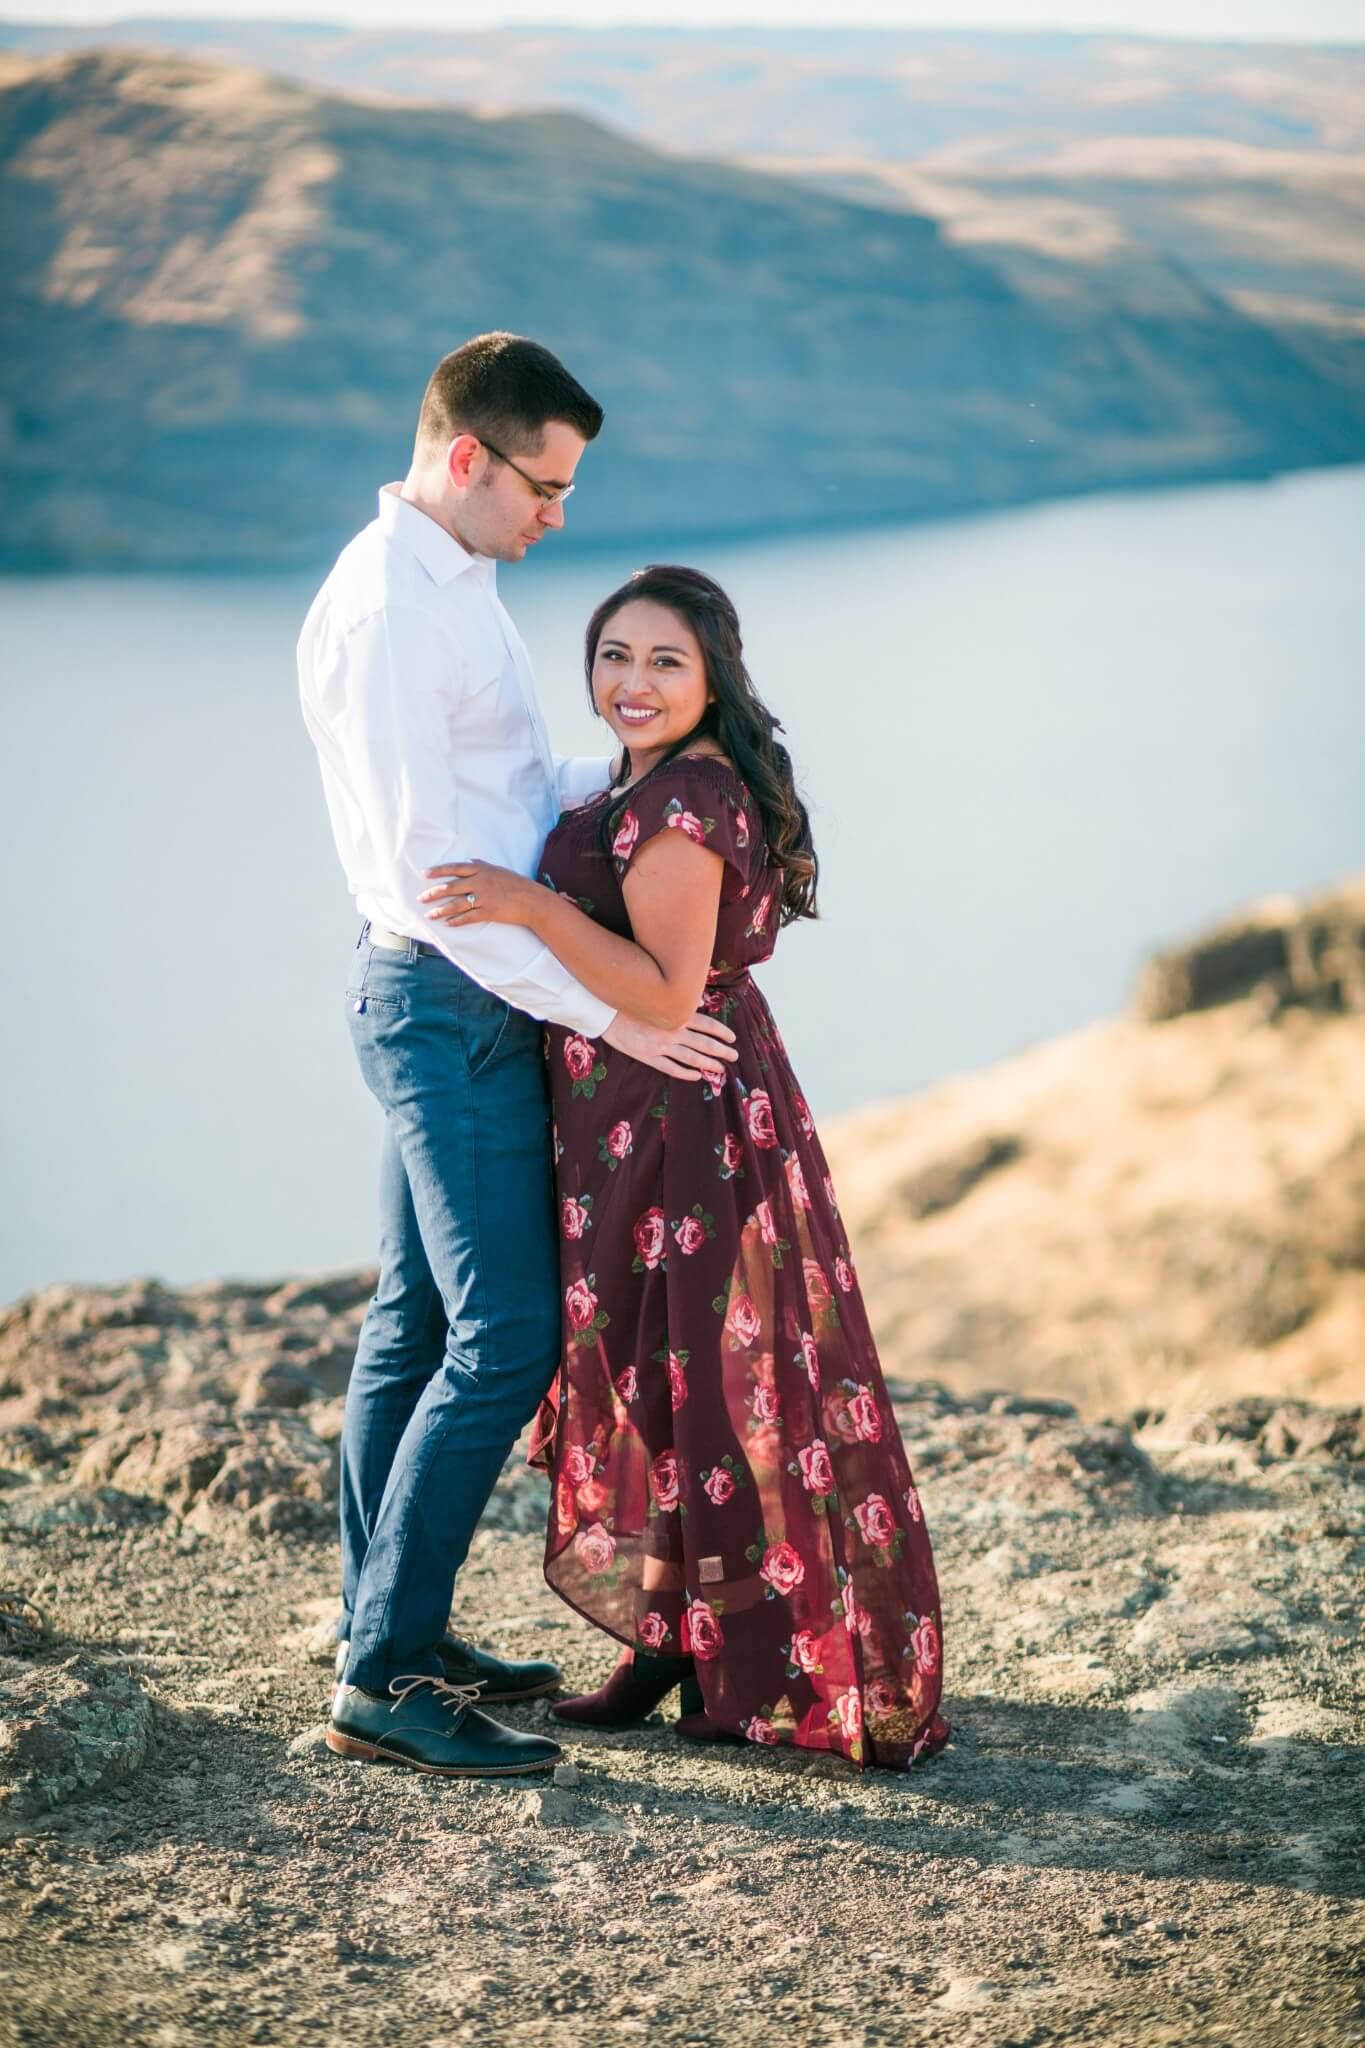 Lesly & Michael Vantage Engagement by Bill Weisgerber Spokane Photographer (11 of 71).jpg